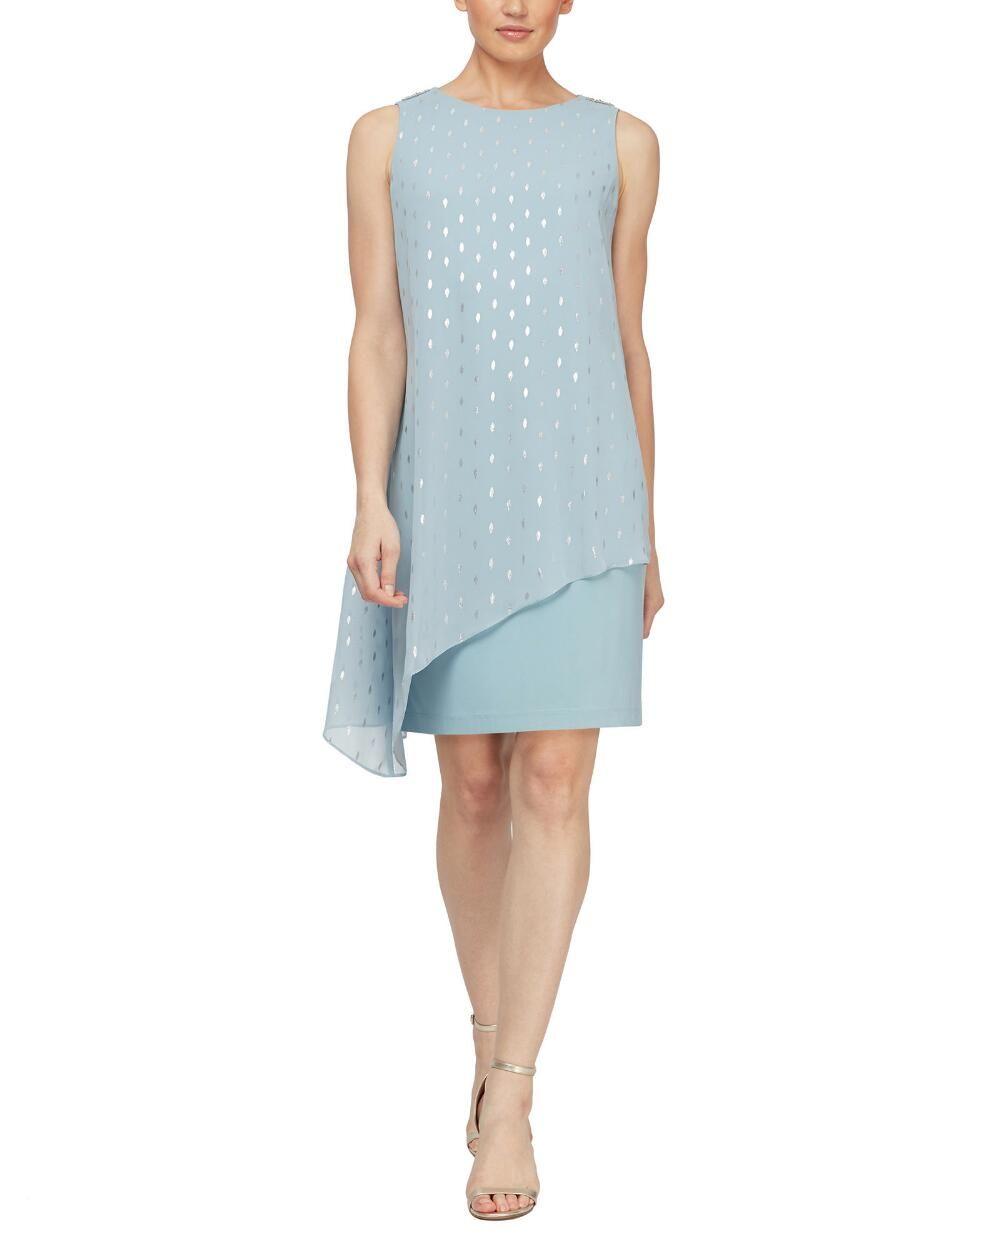 Foil Dot Capelet Shift Dress Casual Work Dresses Shirt Dress Fall Sl Fashions [ 1250 x 1000 Pixel ]